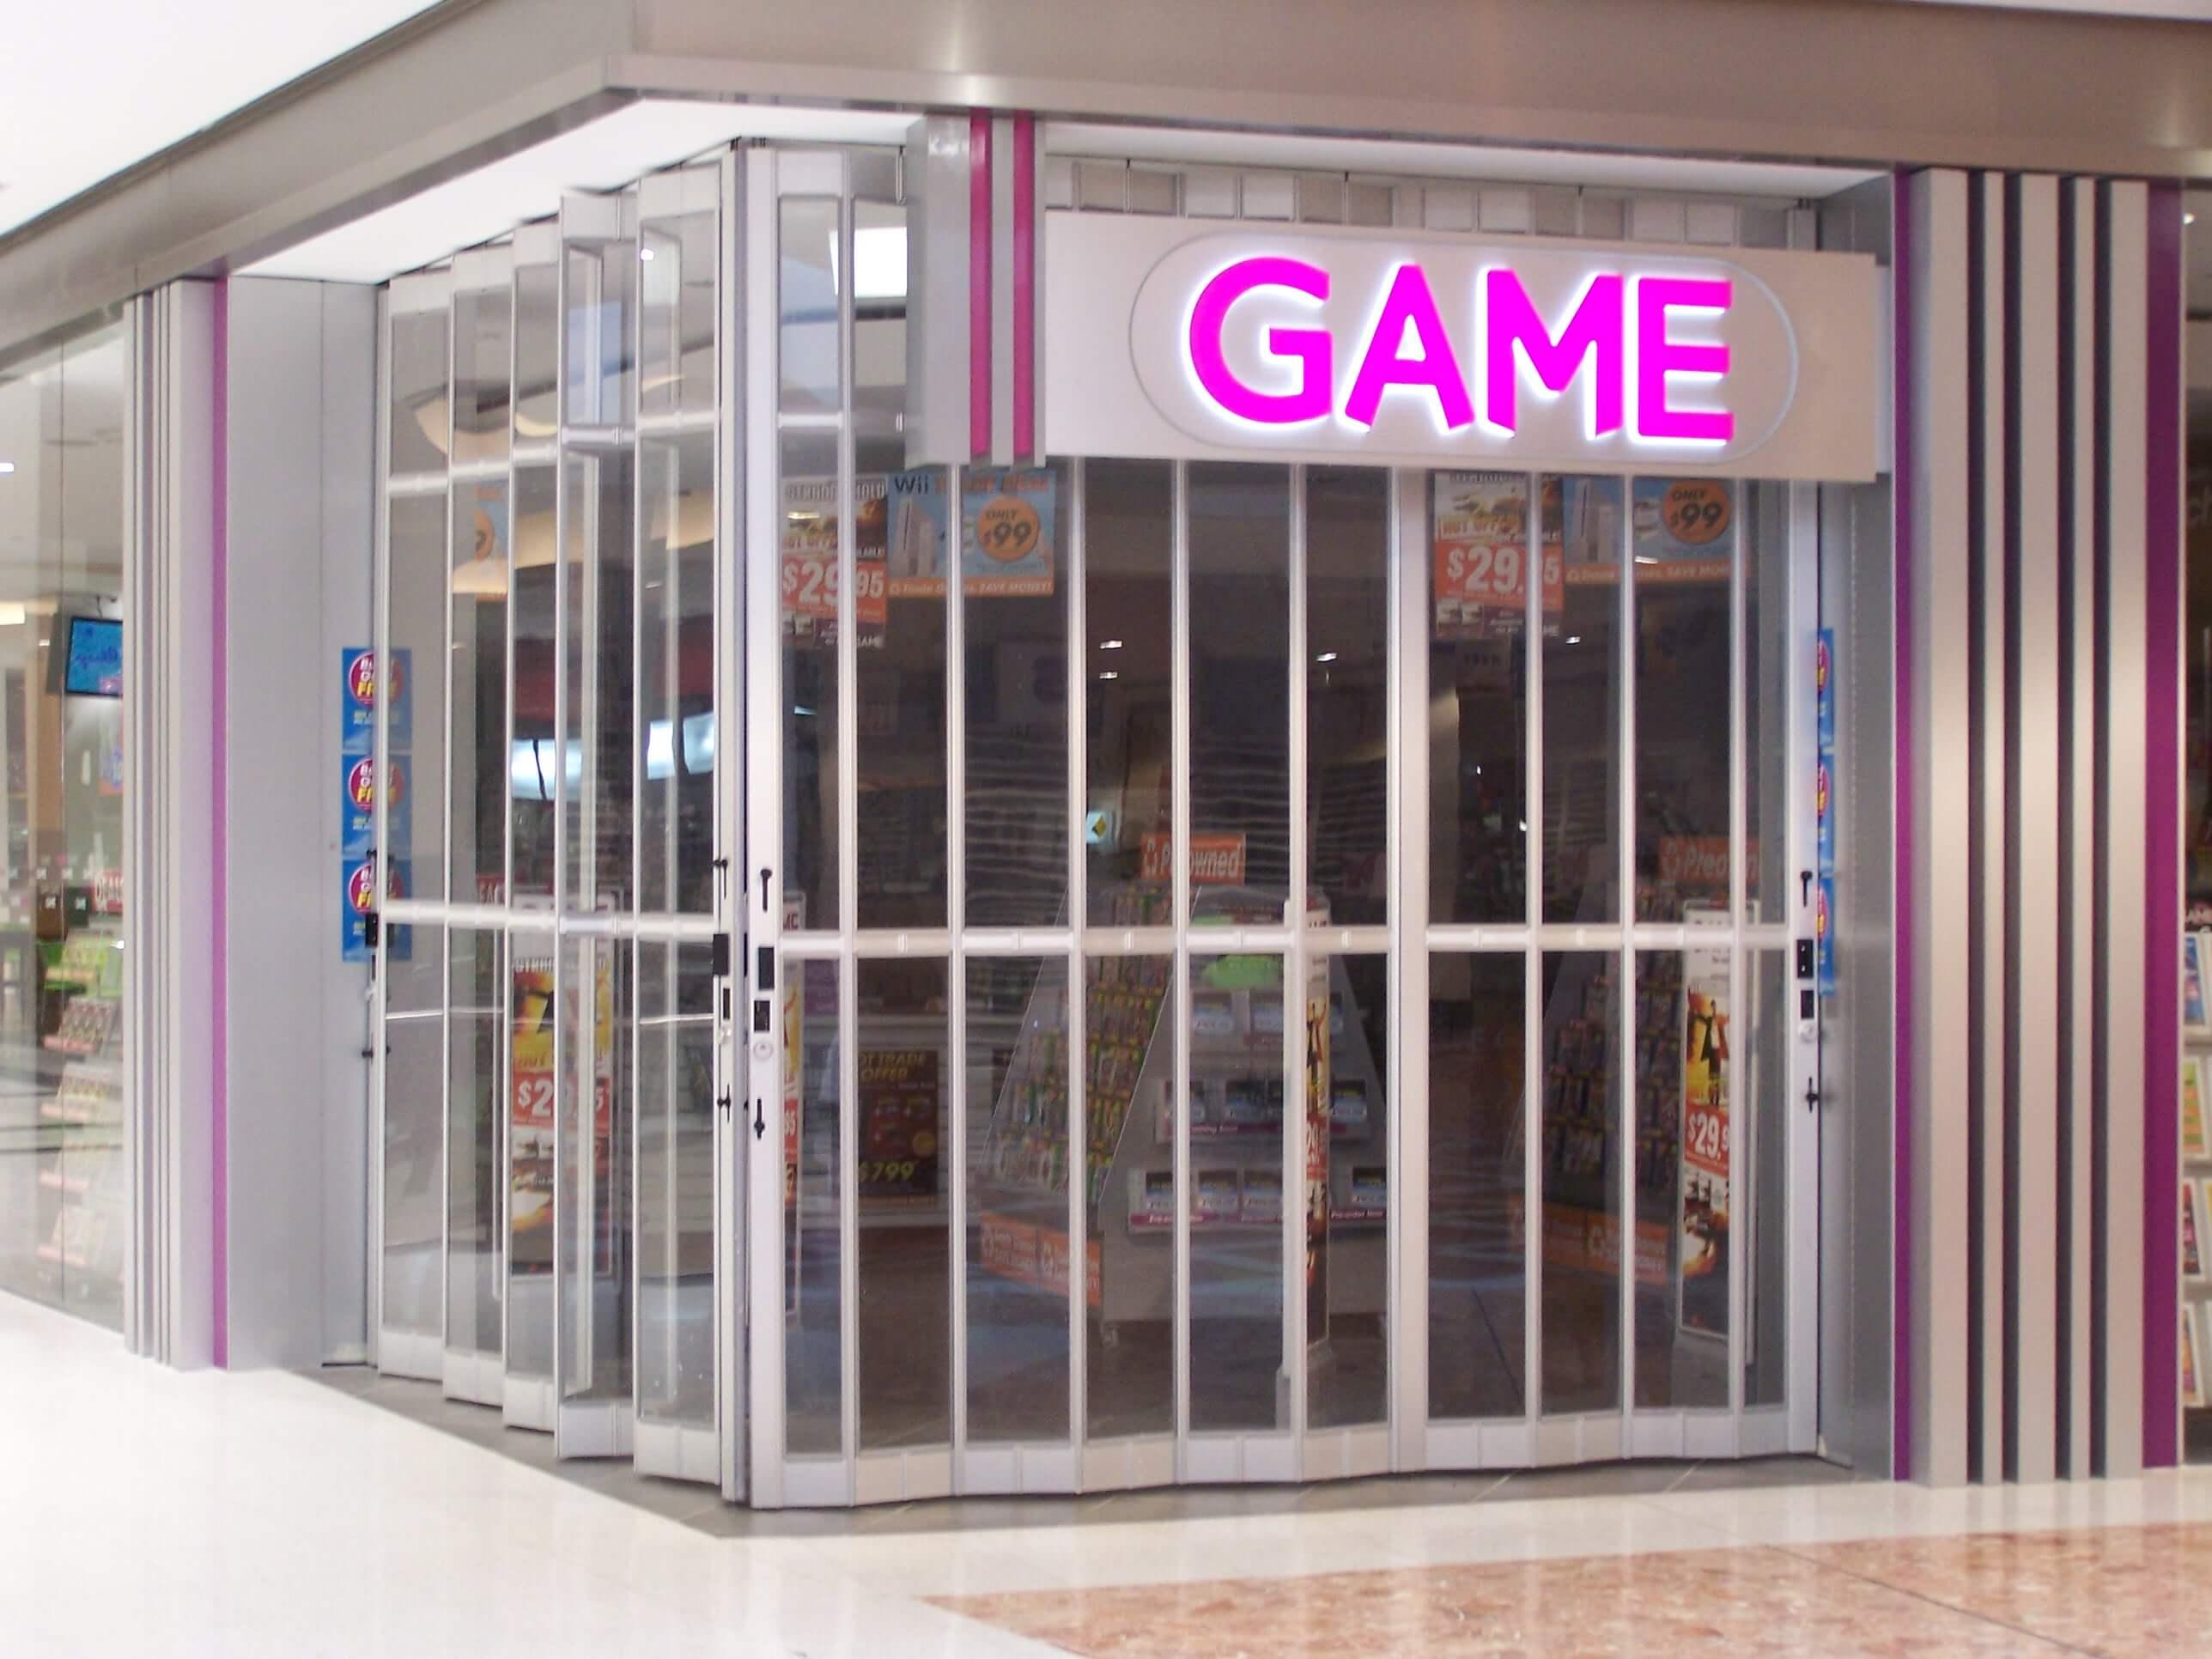 shop doors & FC1 - Folding Closures - Security Doors | Security Doors Melbourne ... pezcame.com